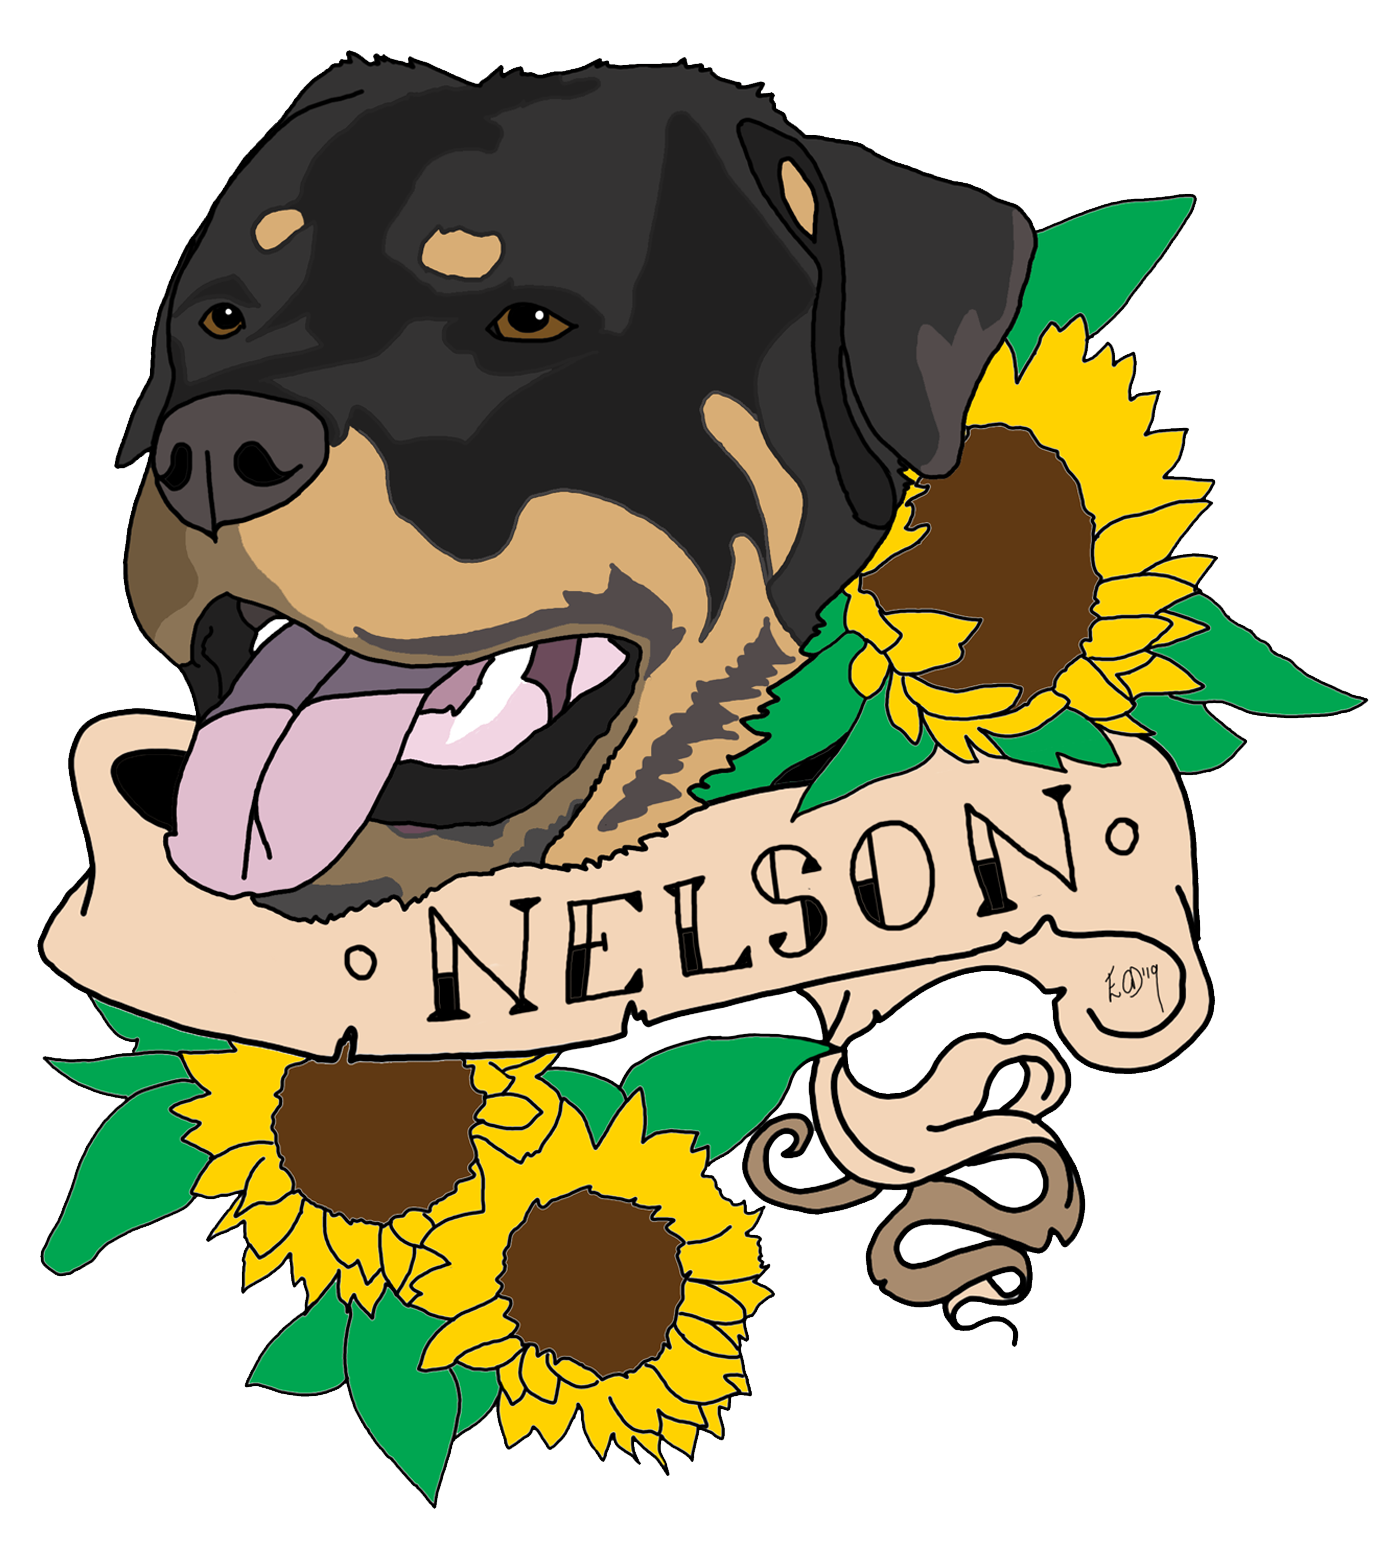 https://0201.nccdn.net/4_2/000/000/060/85f/Nelson-daffodill-scroll.png